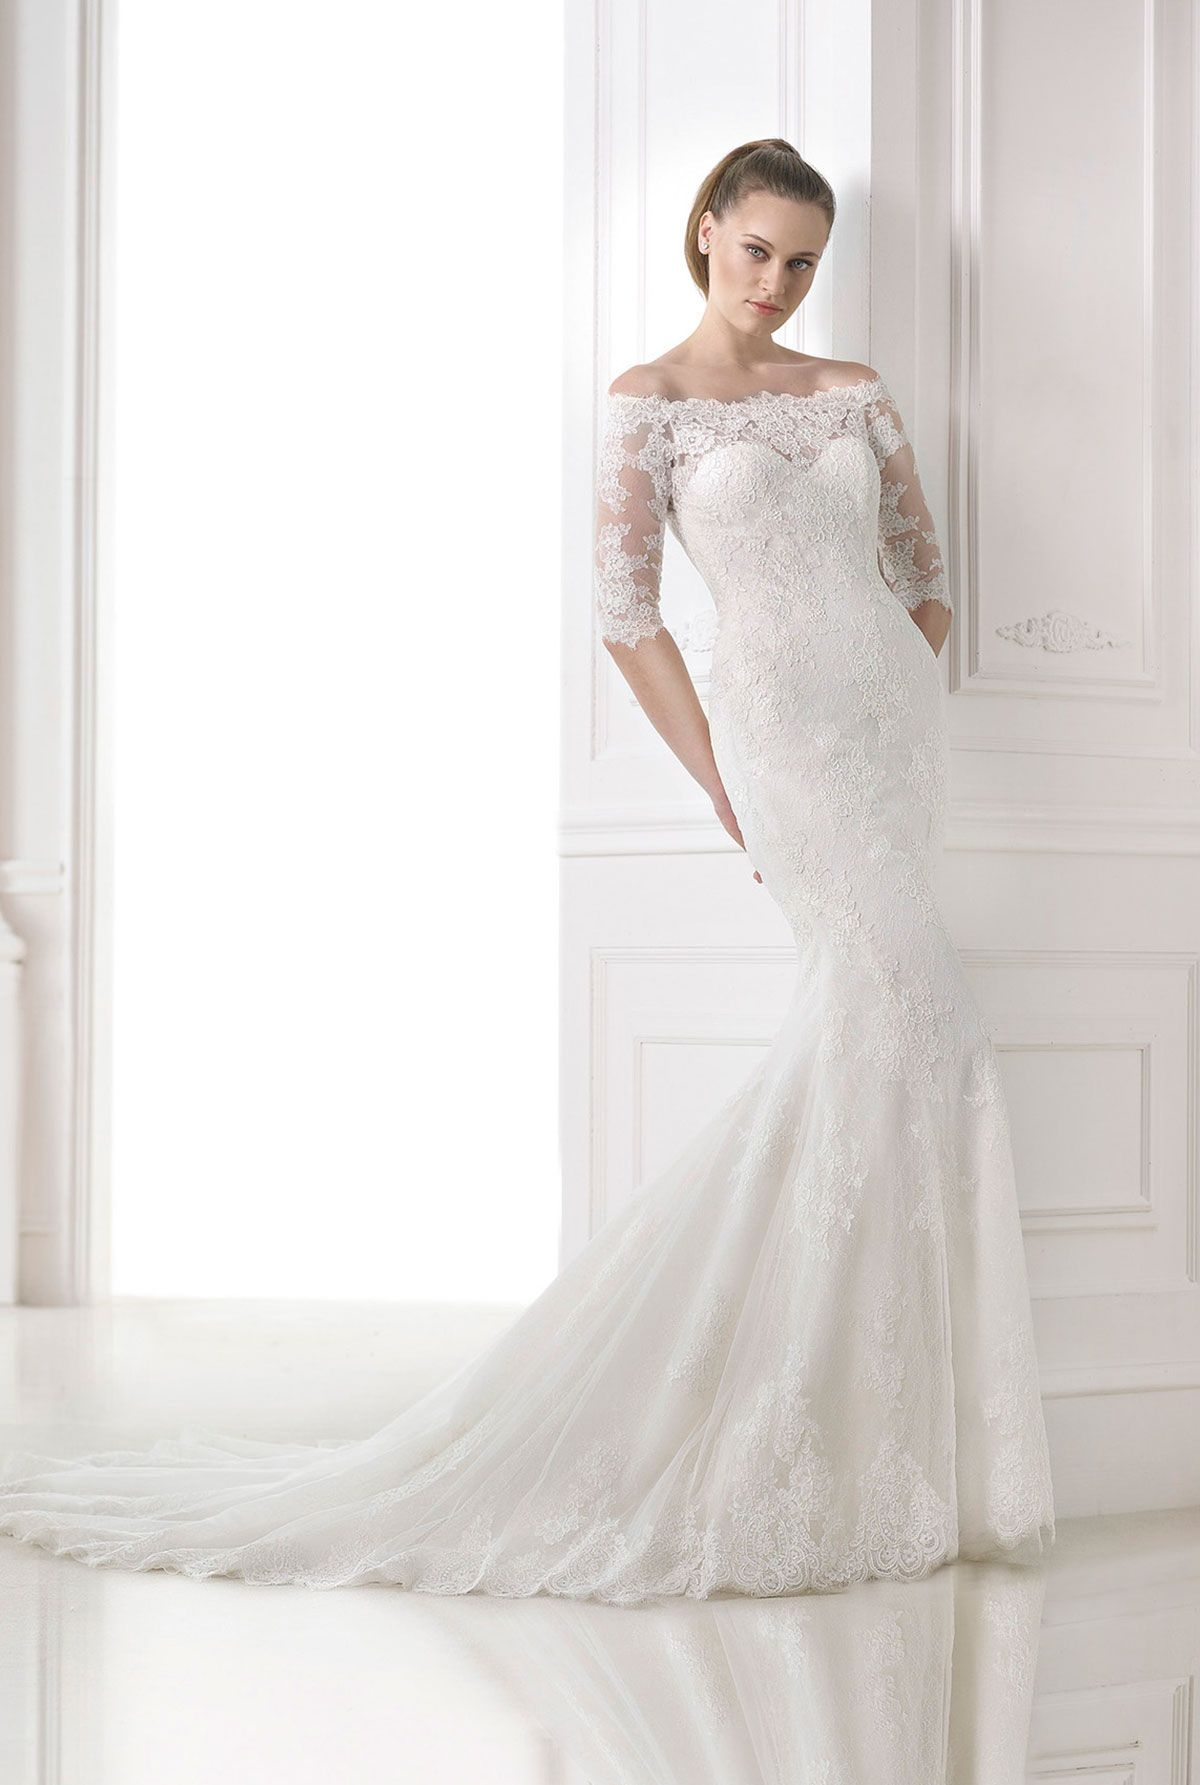 Off the shoulder lace mermaid wedding dress  Pronovias  Mandara  Dress  Pinterest  Wedding dress and Weddings